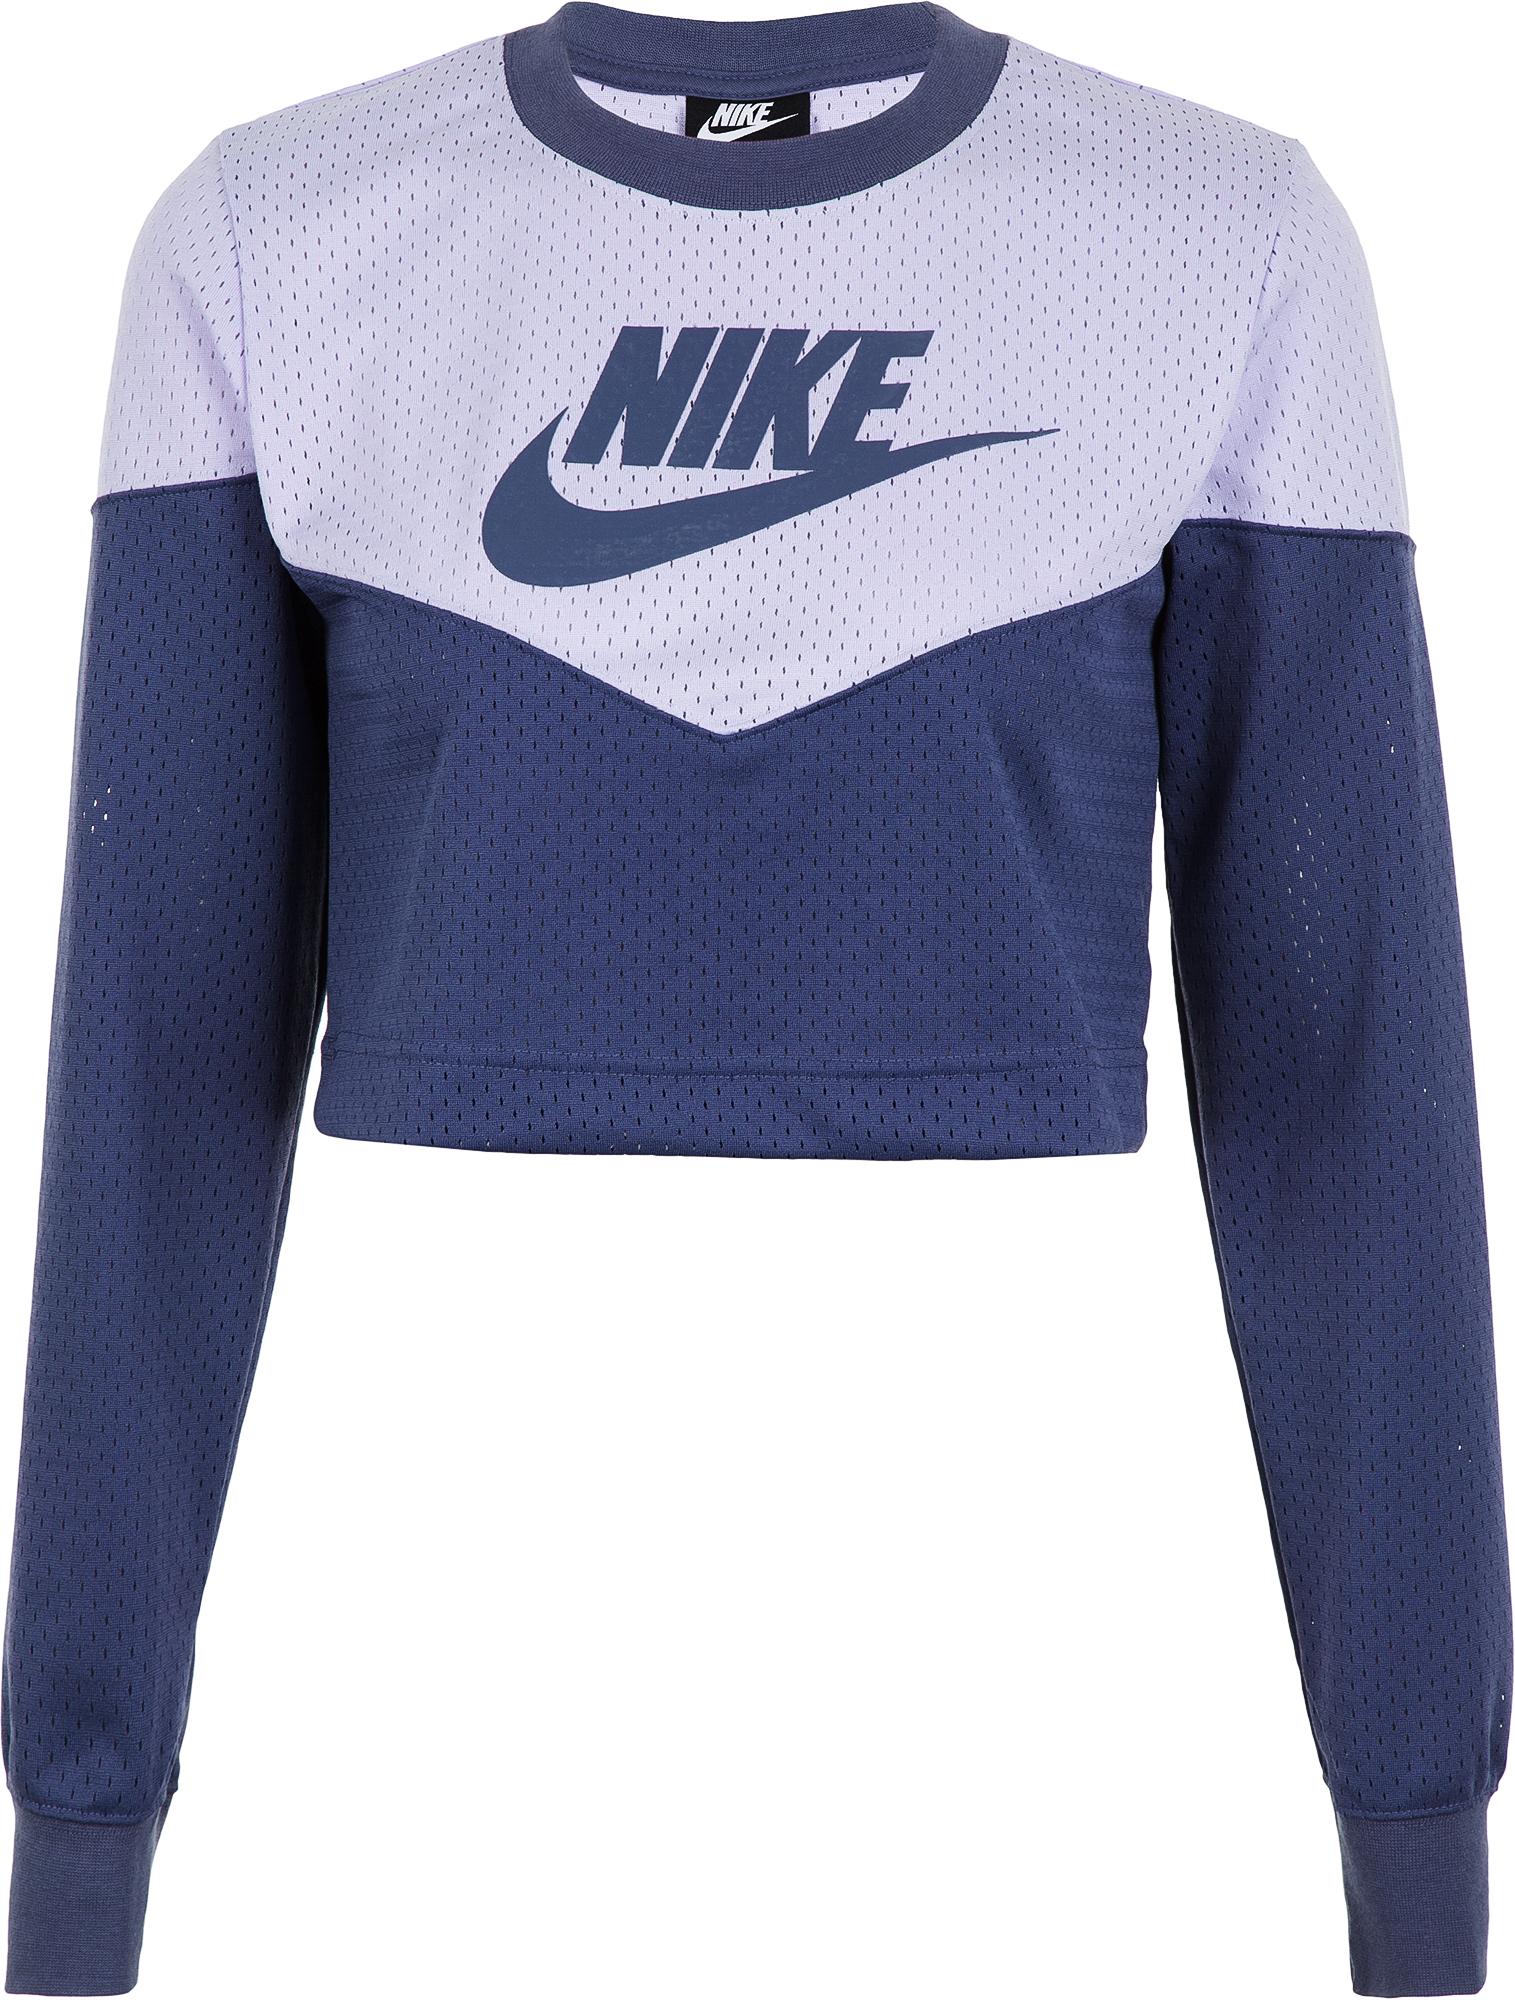 Nike Лонгслив женский Nike Sportswear Heritage, размер 46-48 цены онлайн